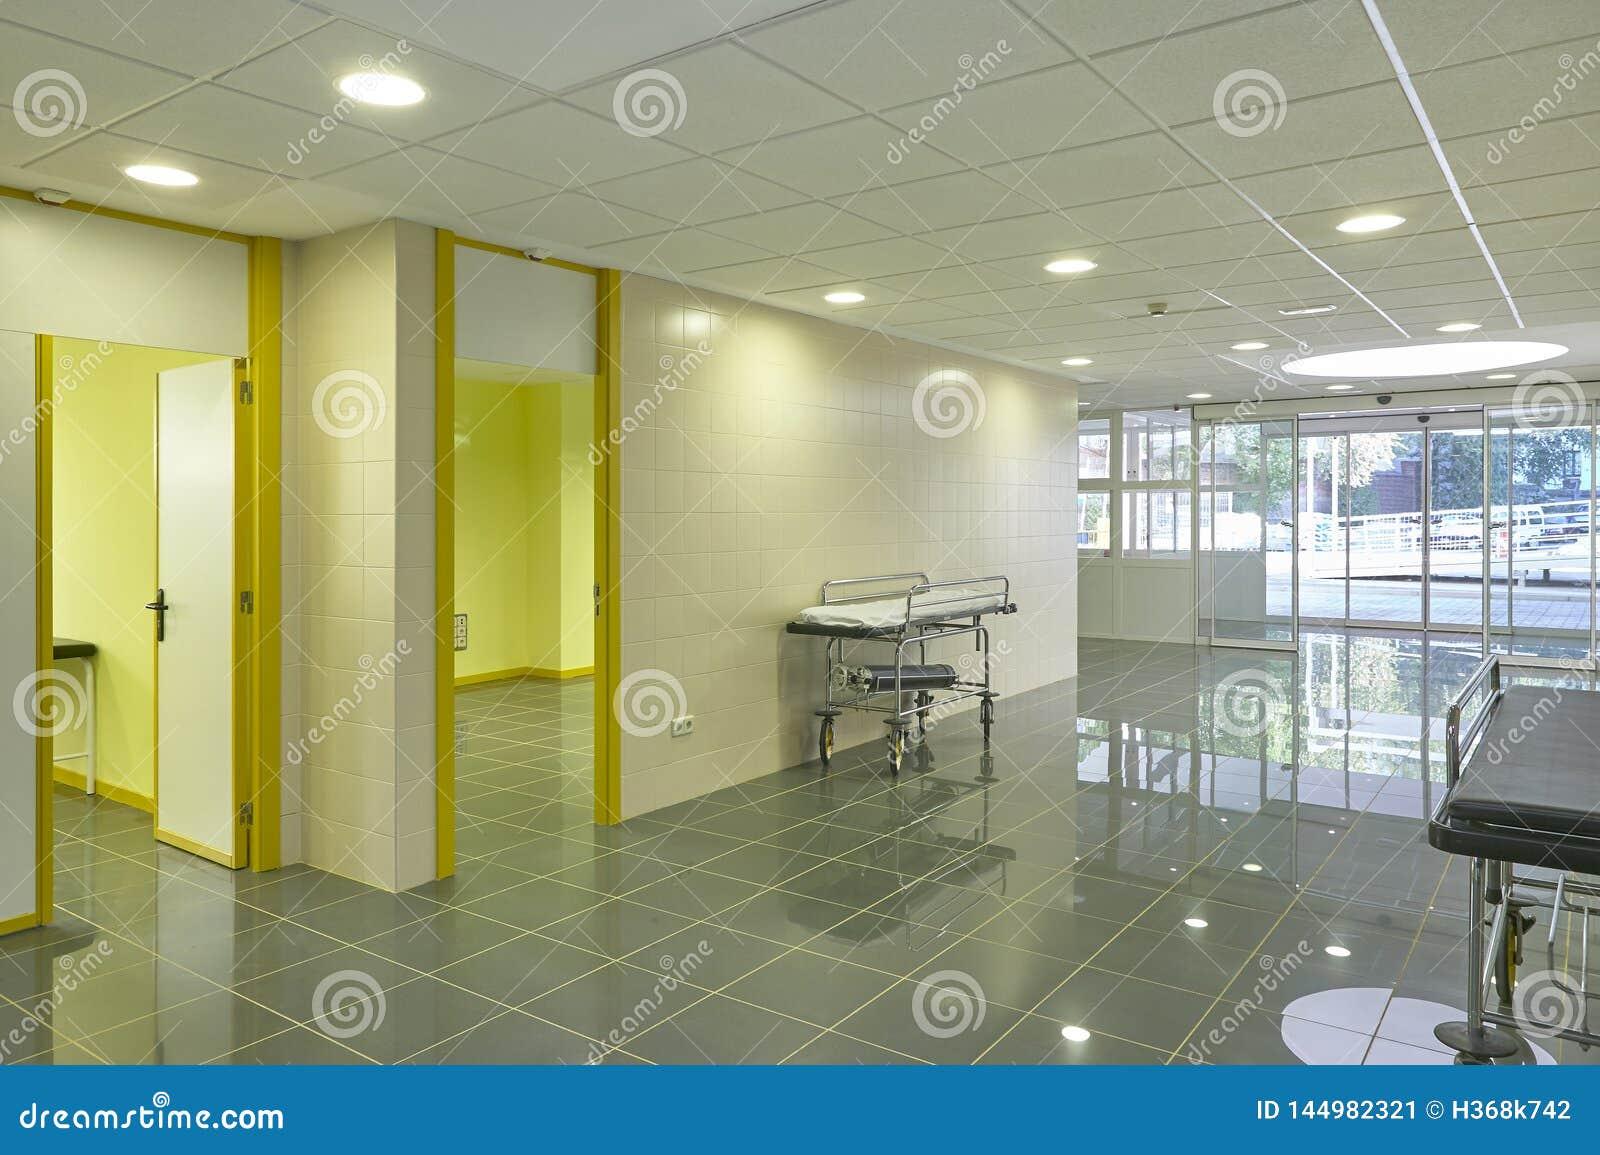 Hospital emergency entrance hallway. Health center indoor corridor